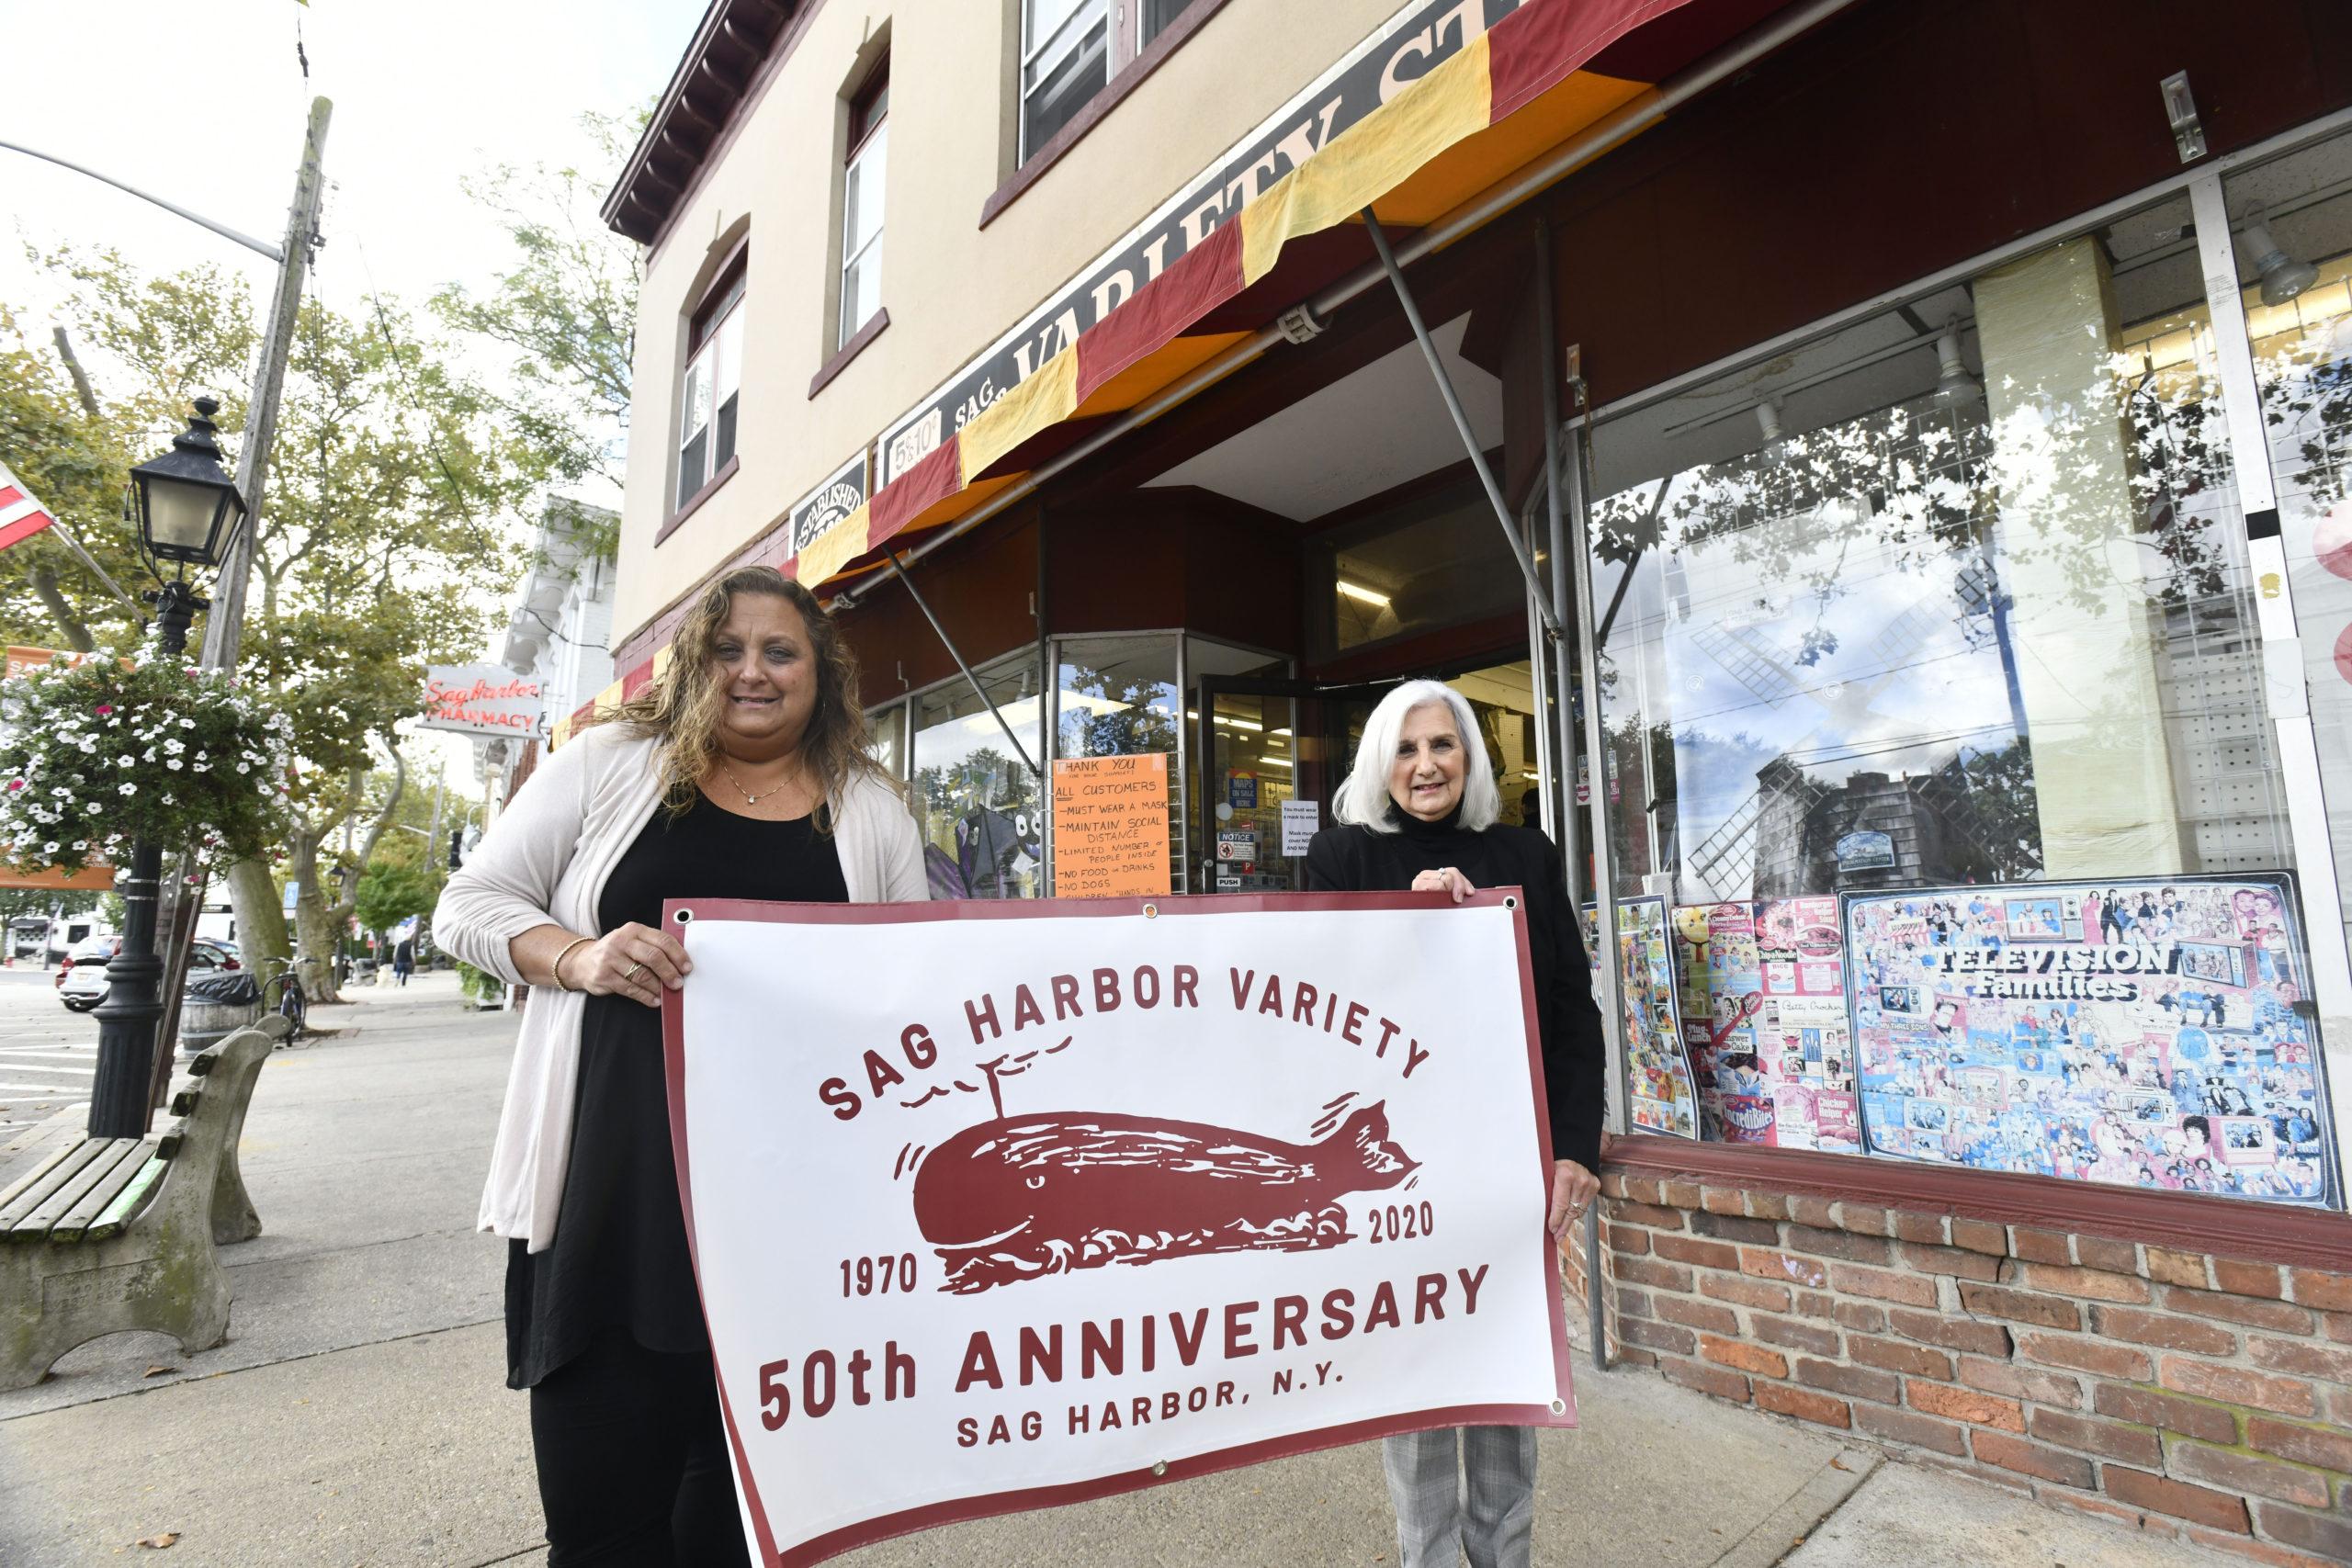 Lisa Field and Roseann Bucking at the Sag Harbor Variety Store.  DANA SHAW